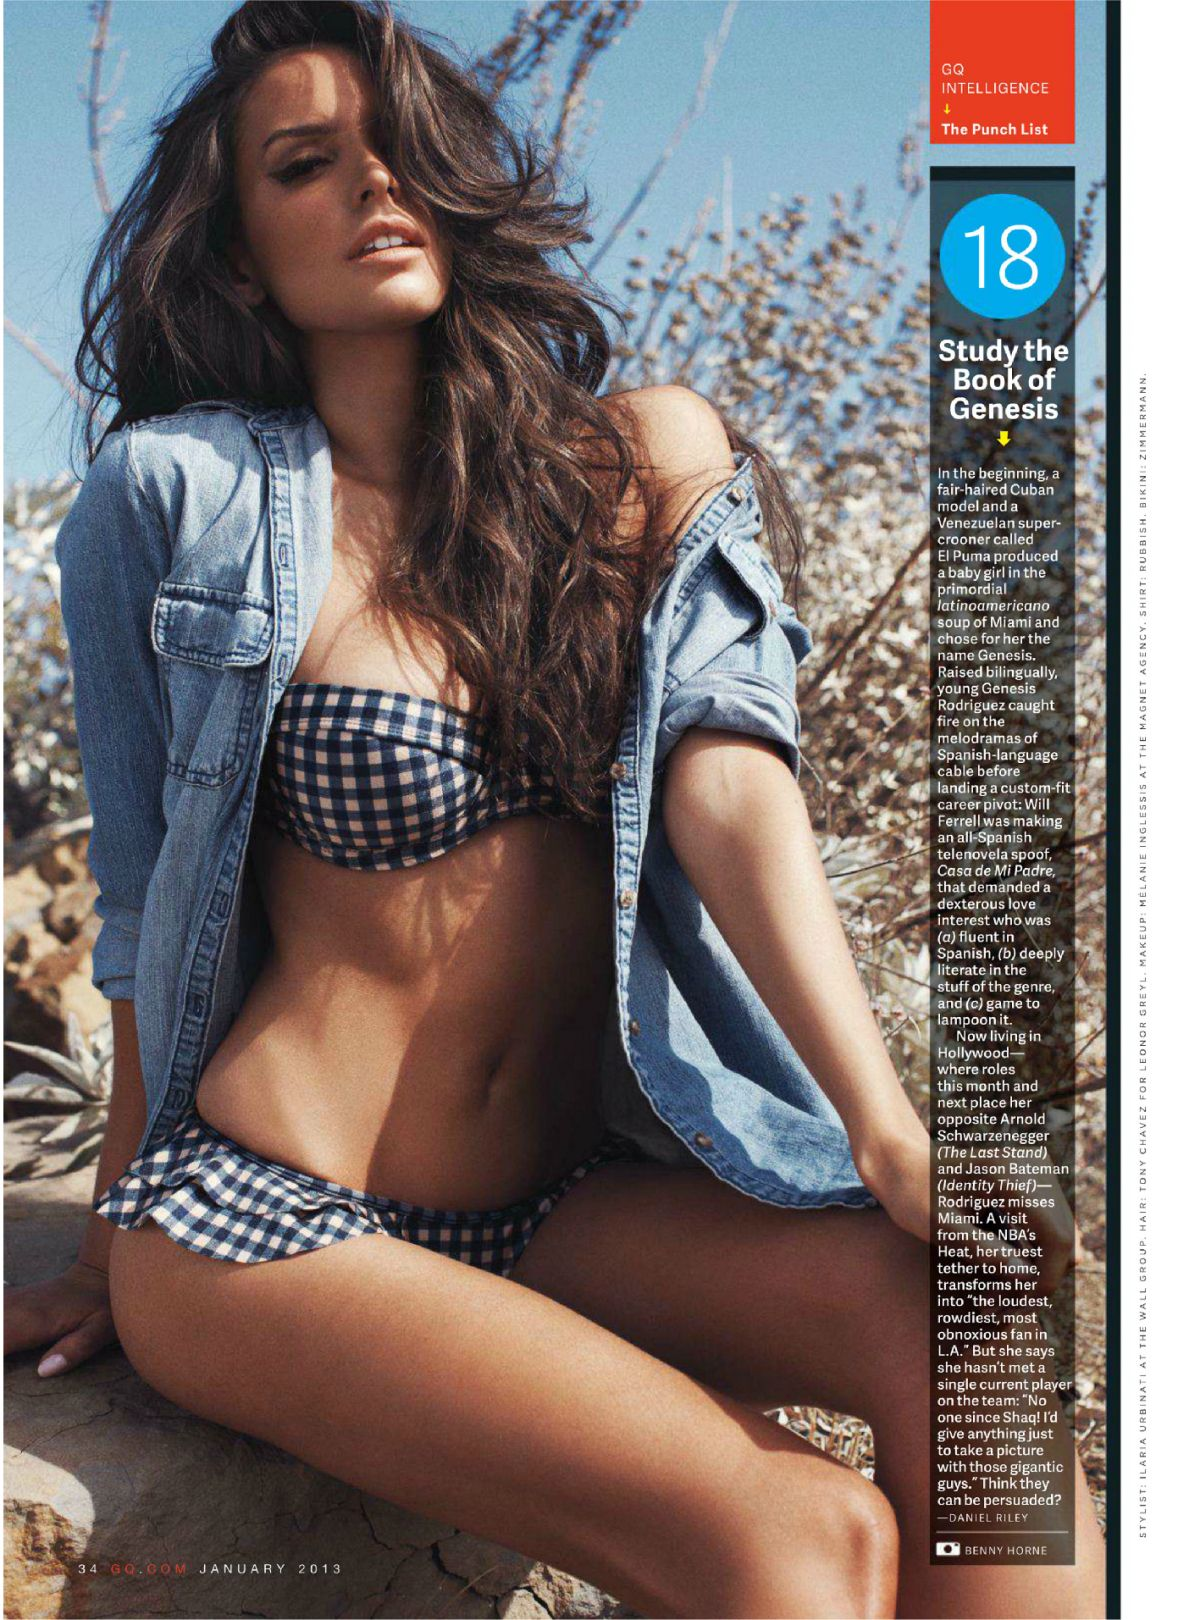 GENESIS RODRIFUEZ in GQ Magazine, January 2013 Issue